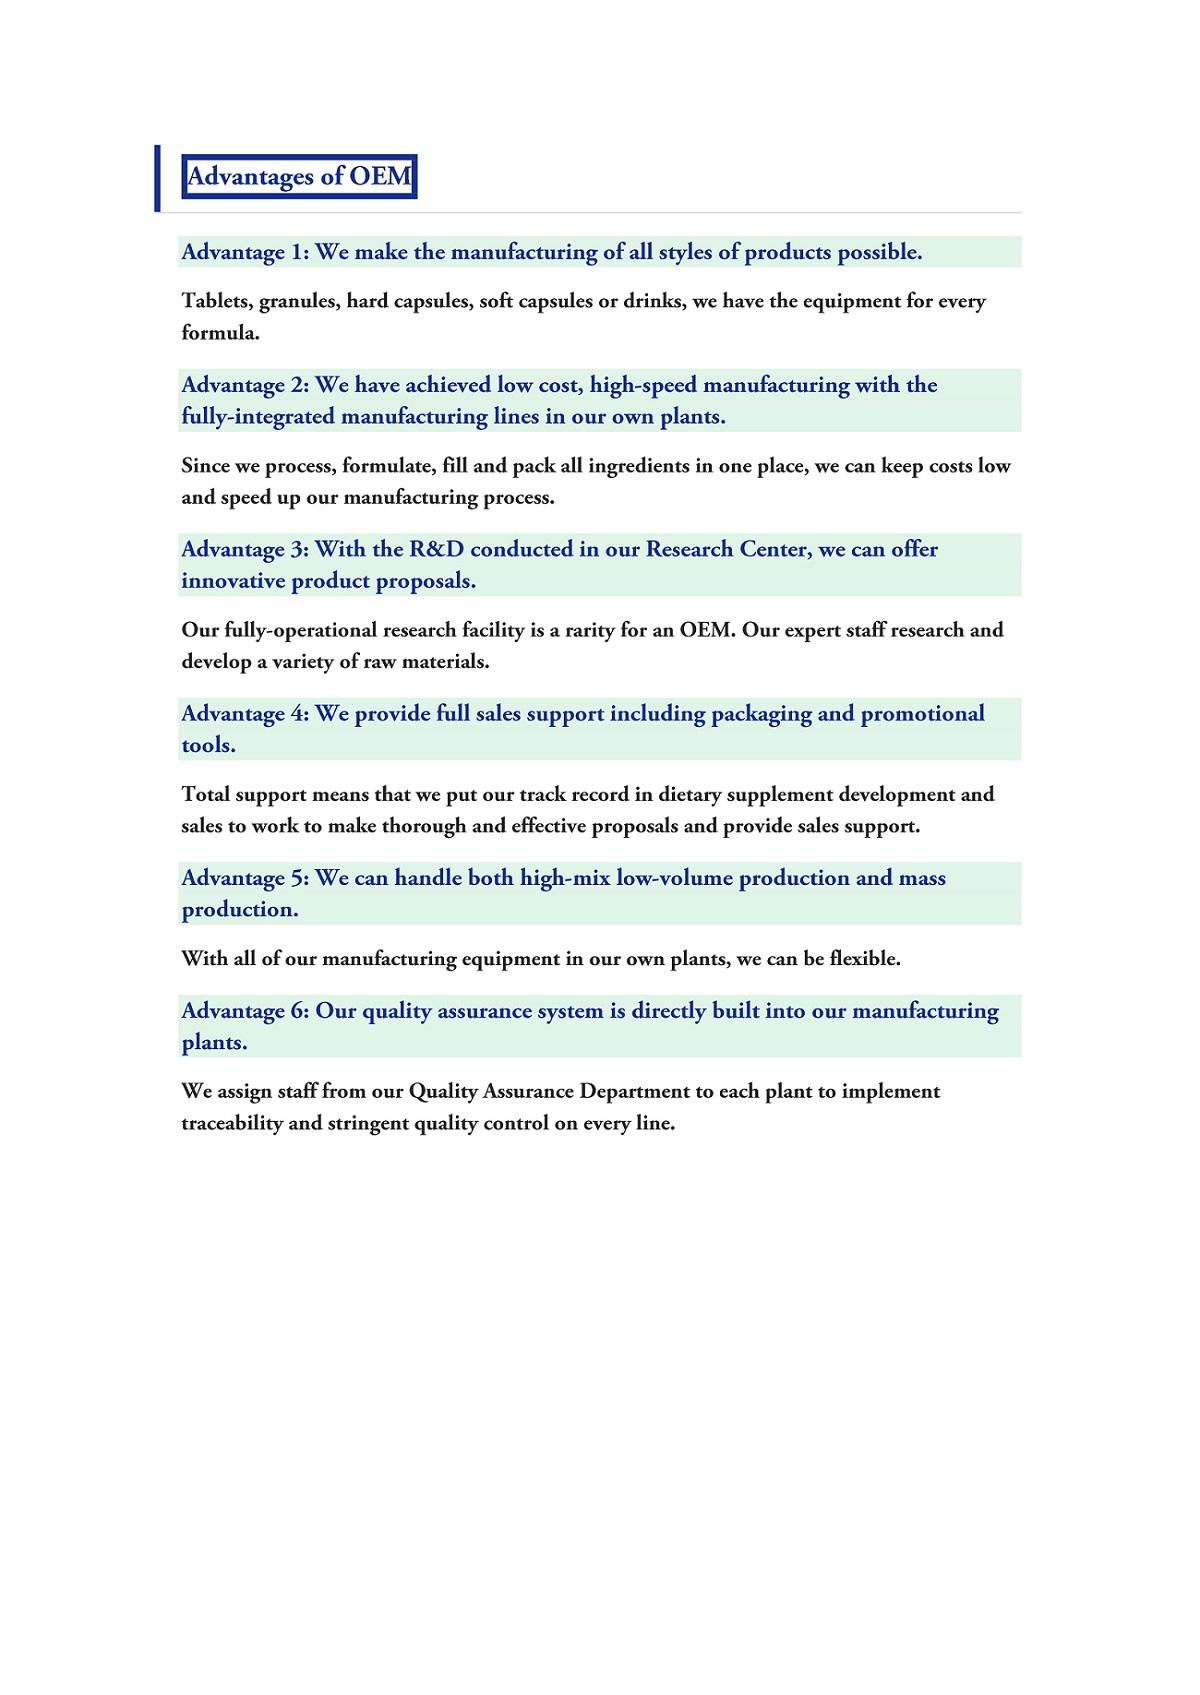 Advantages of OEM